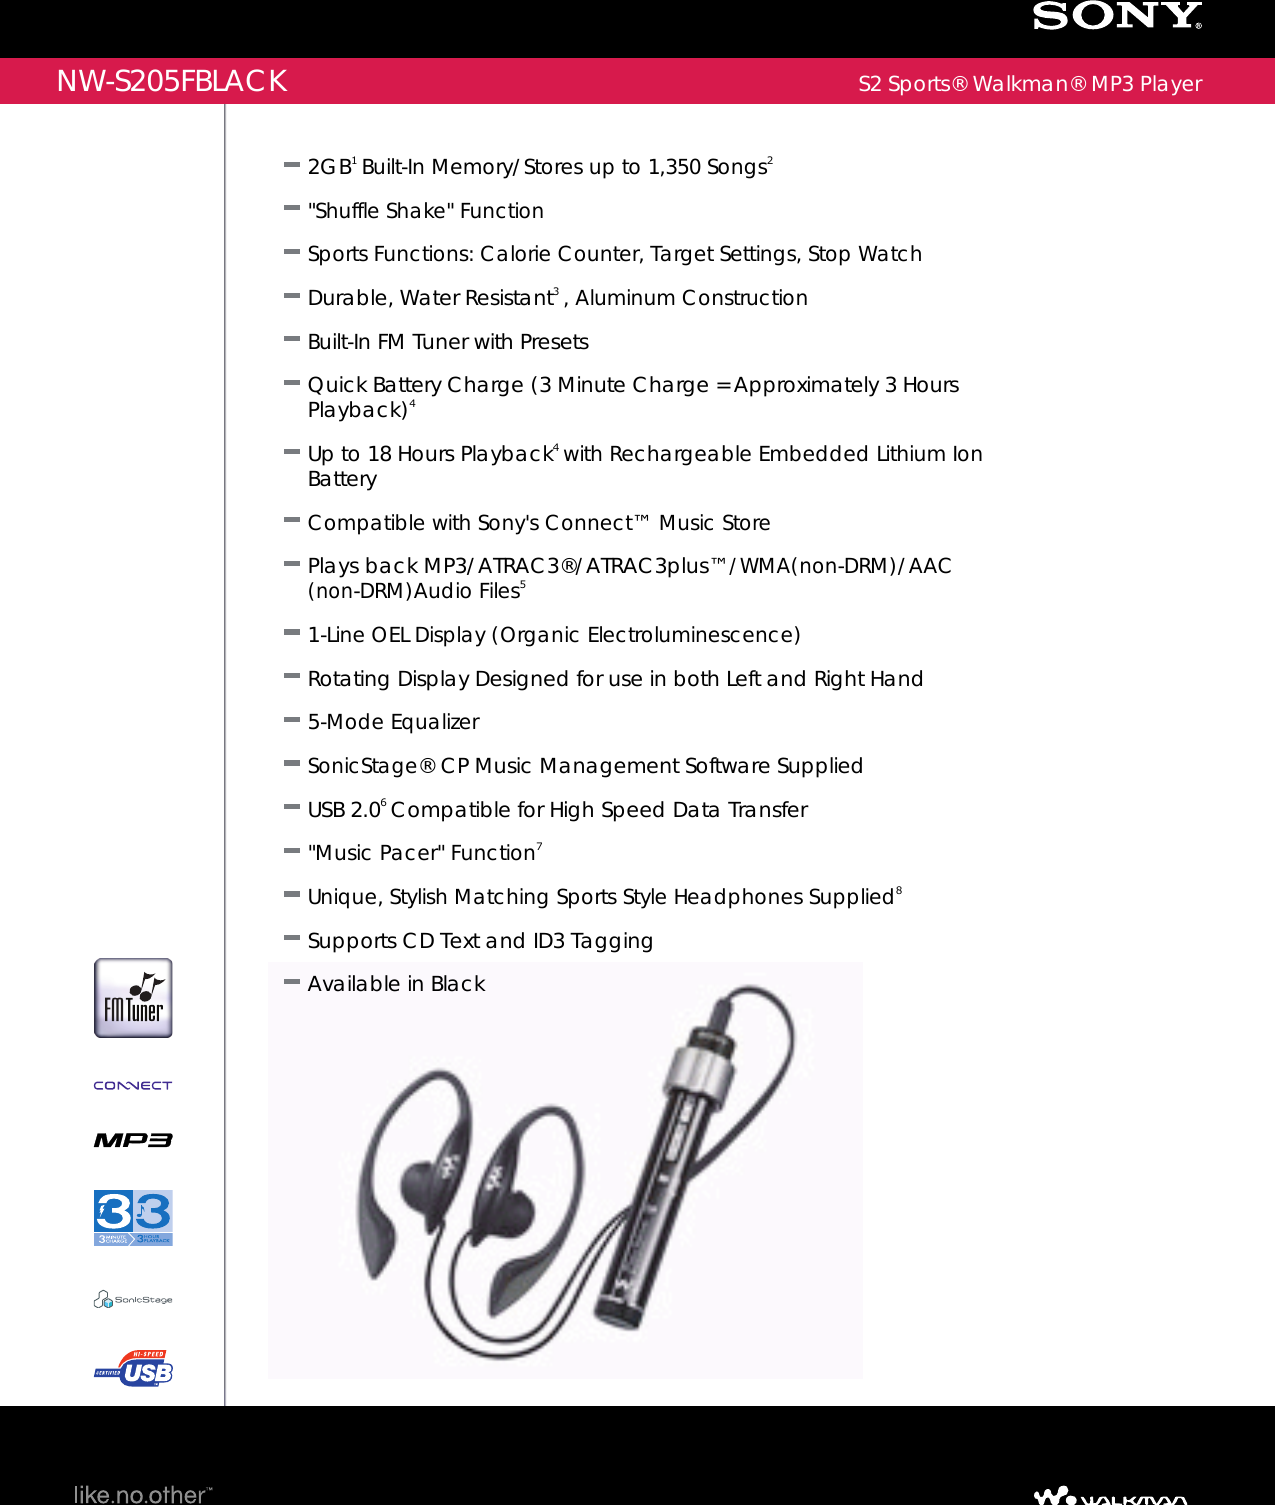 sony nw s205f user manual marketing specifications nws205fblack mksp rh usermanual wiki Infinity PRV250 Manual Sport Club Penguin Codes